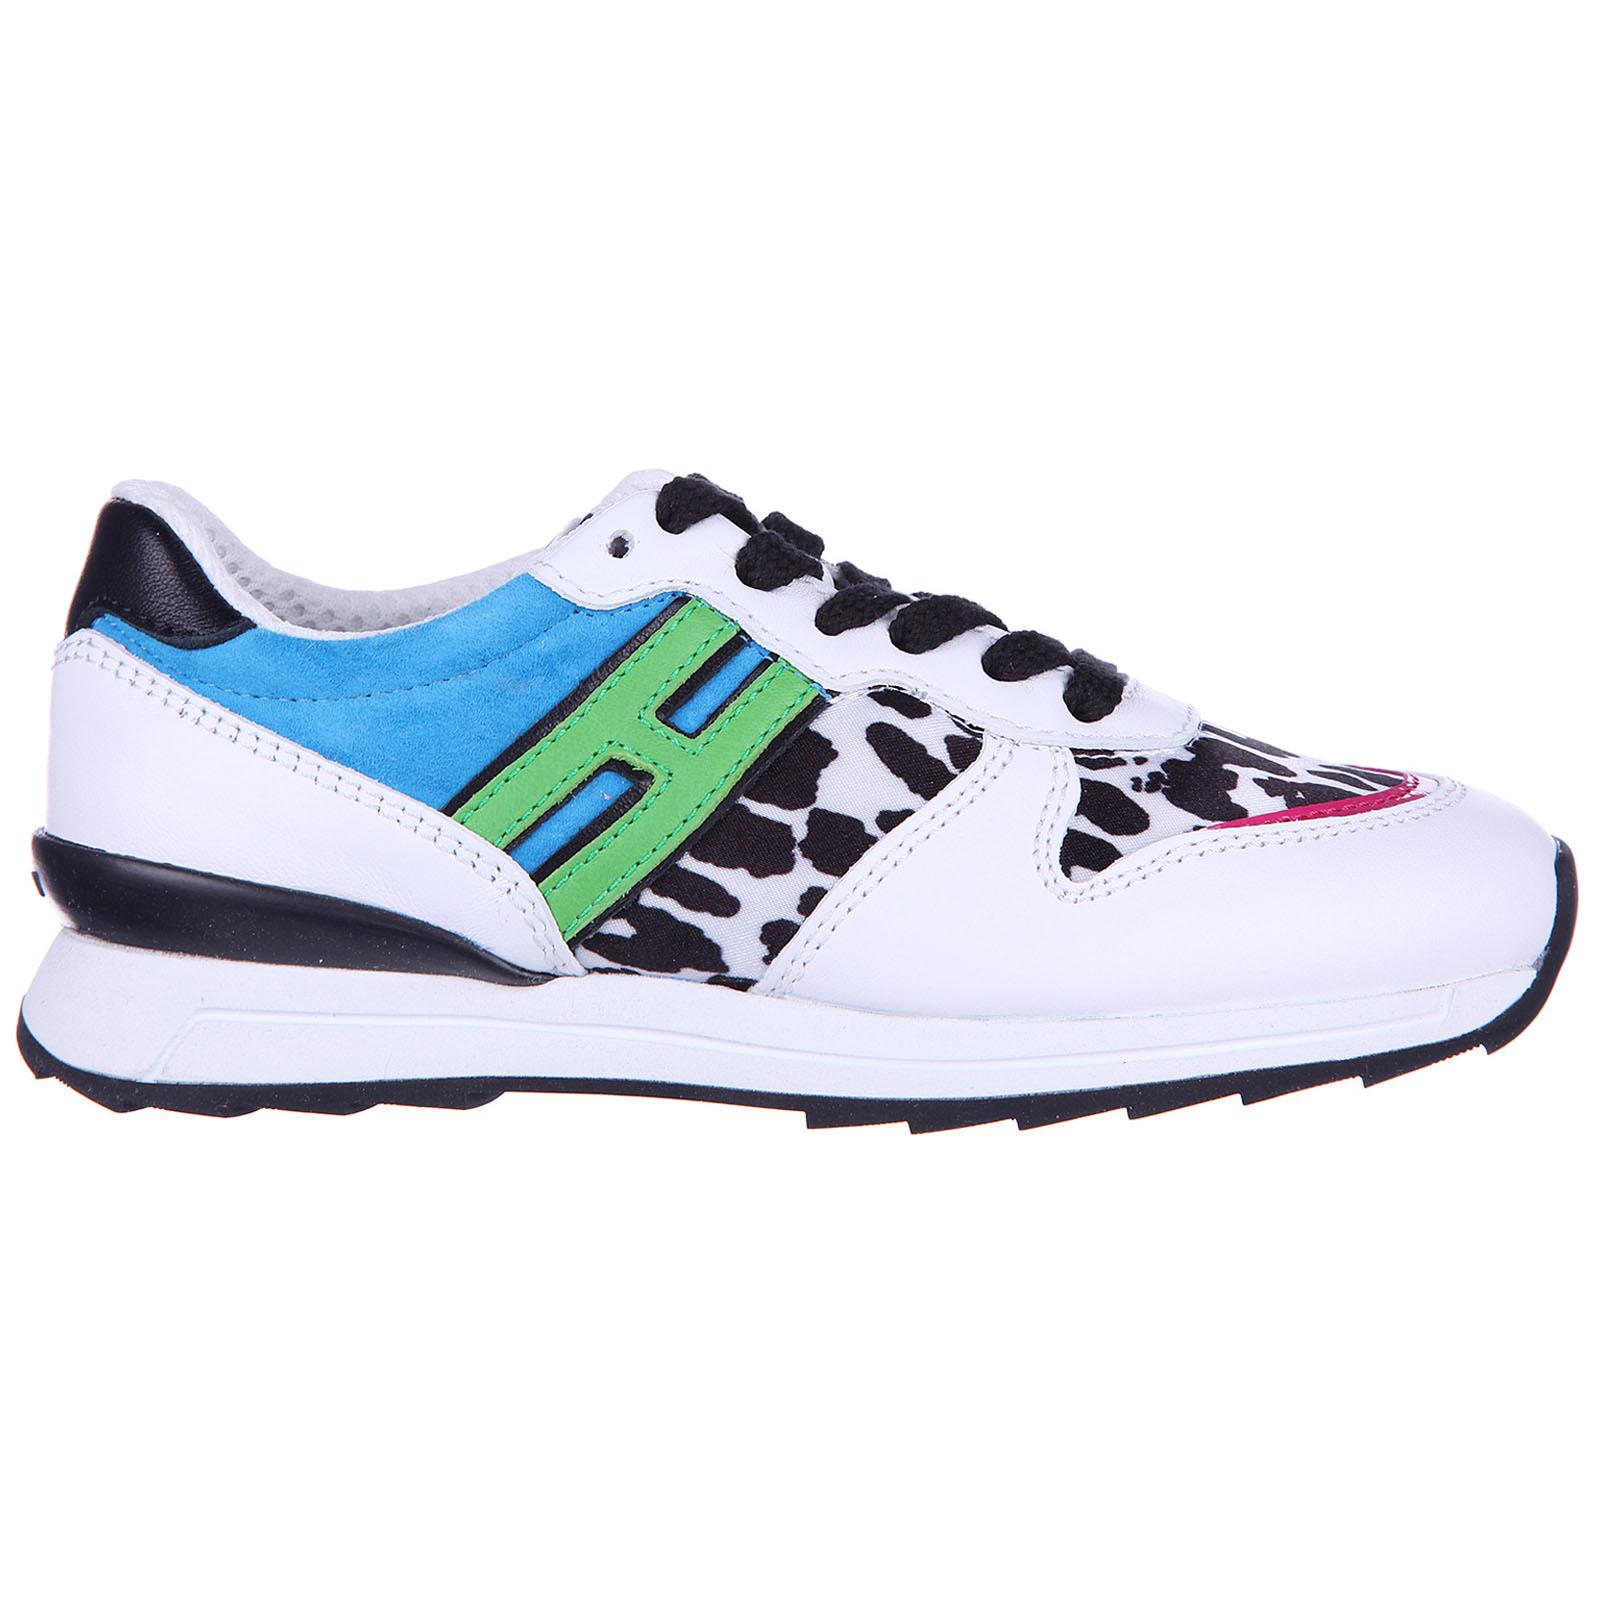 Scarpe sneakers bambina pelle r261